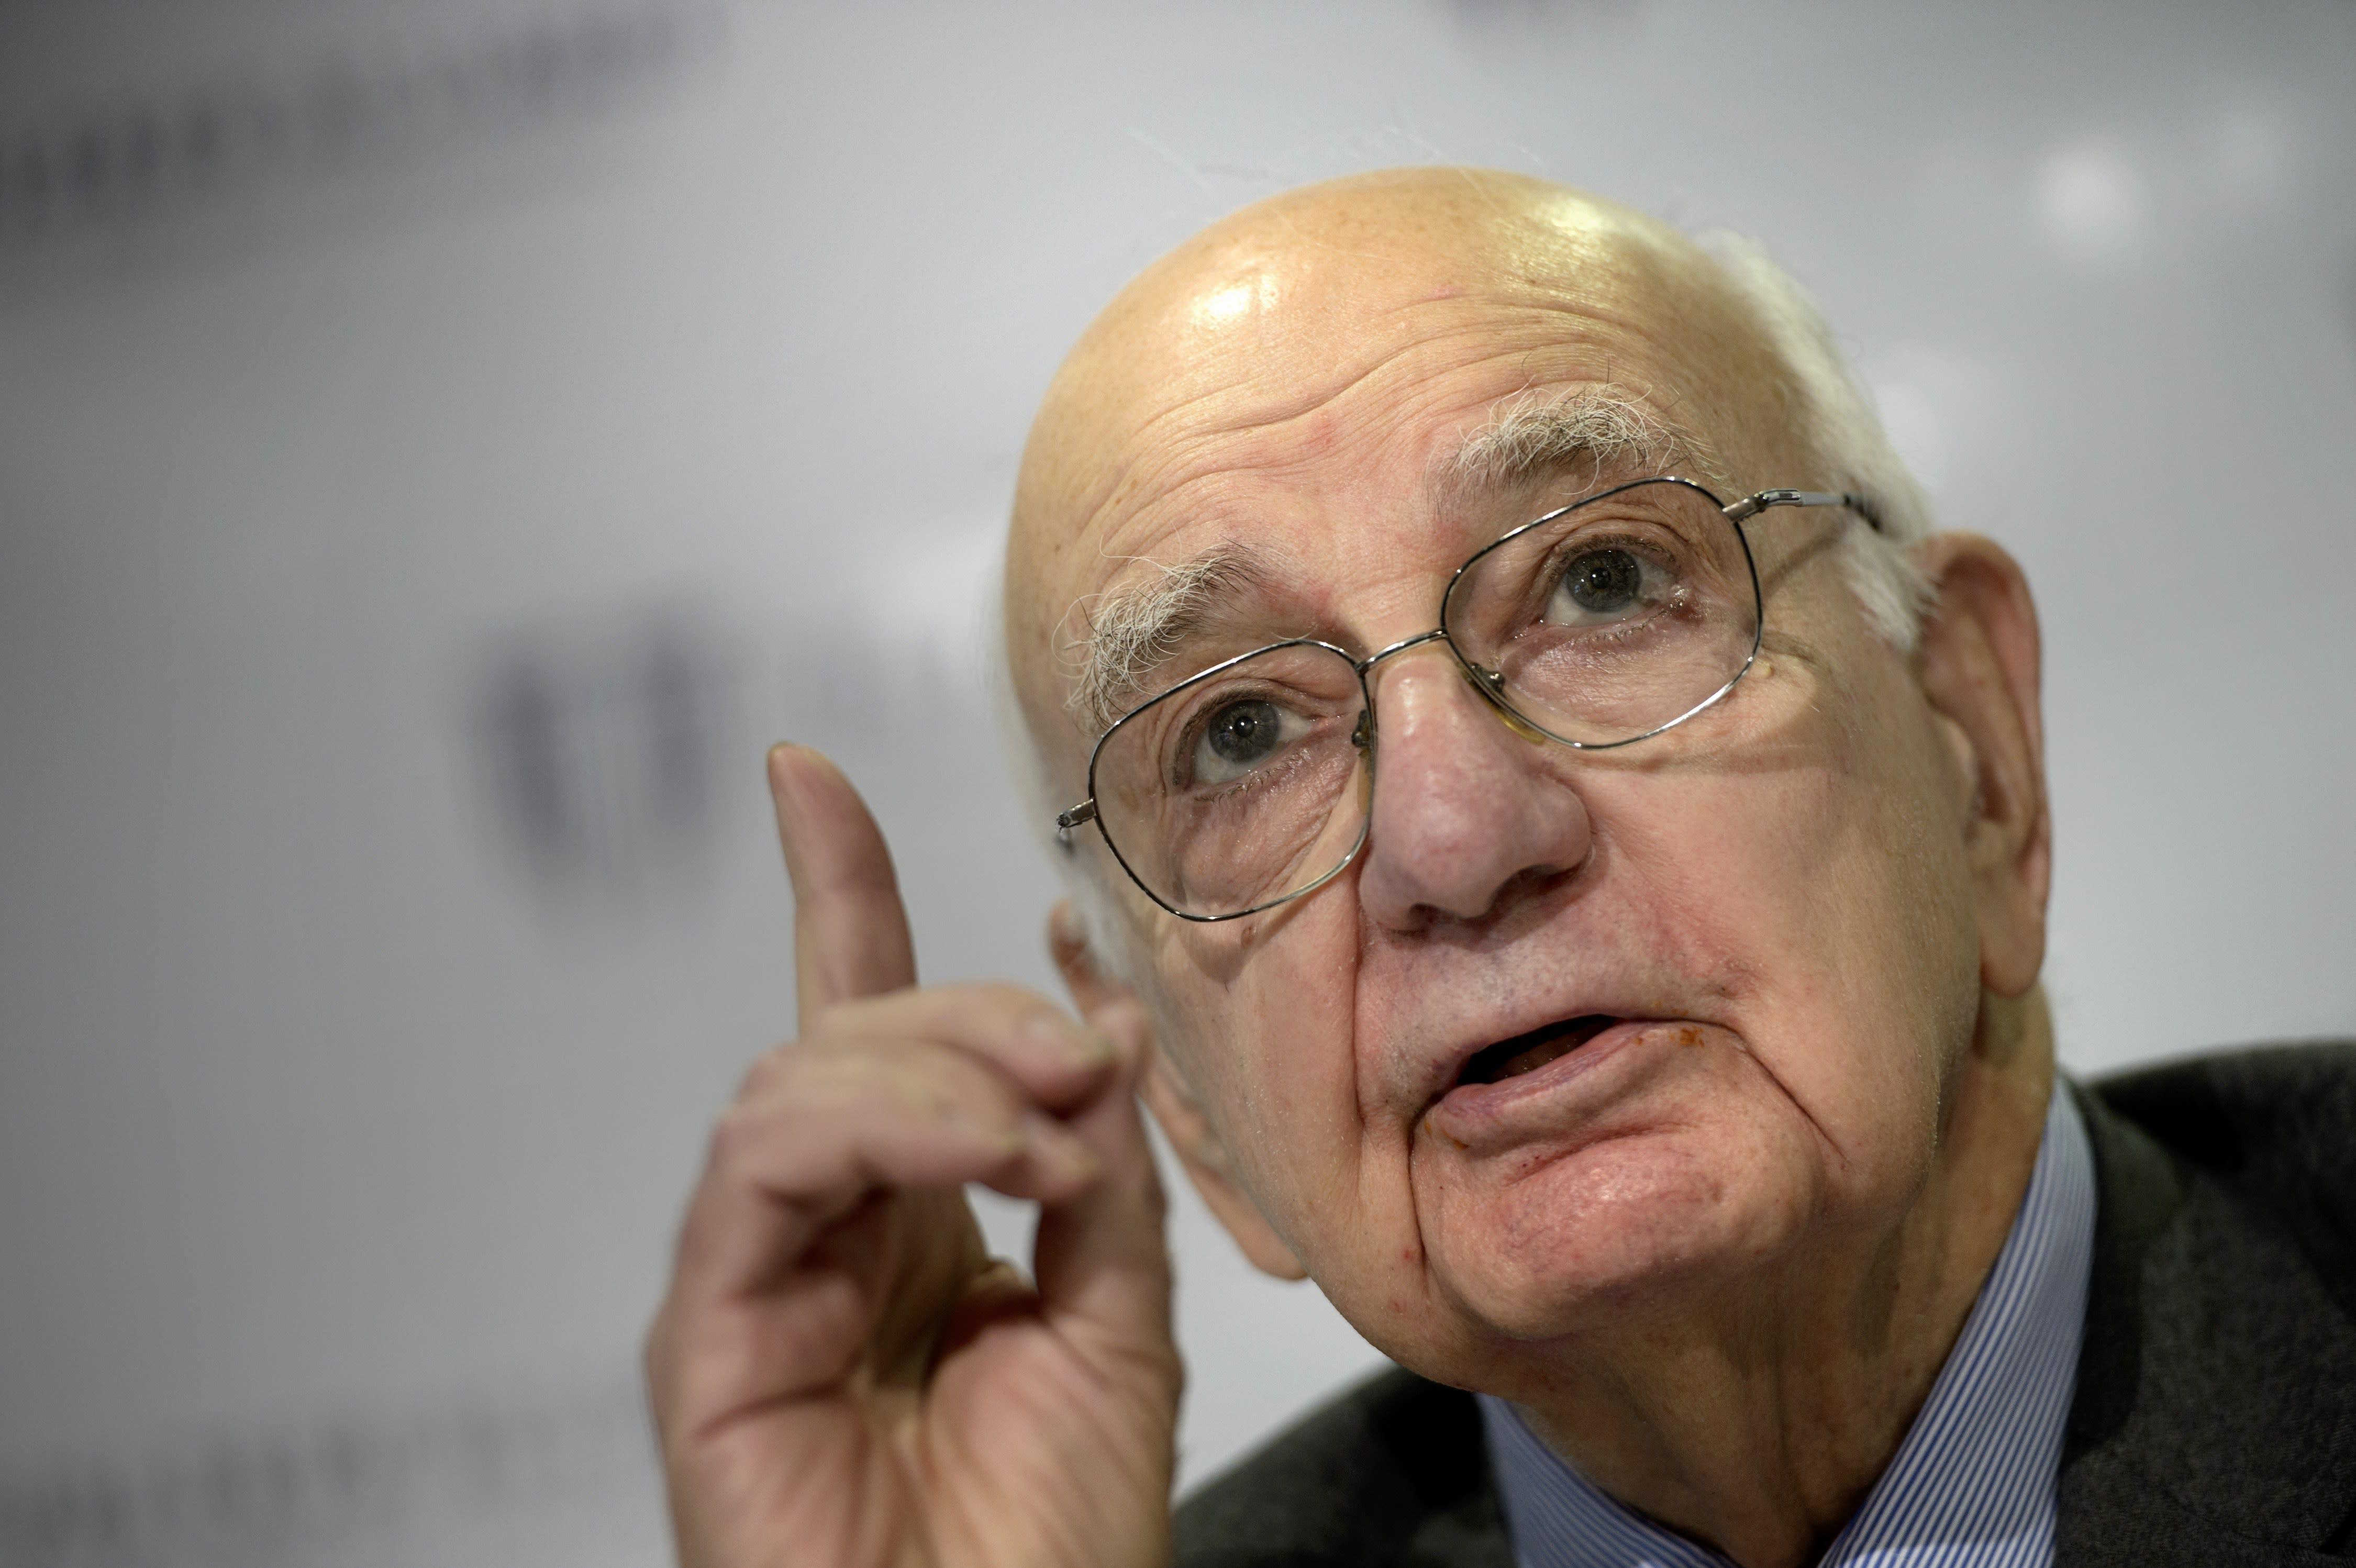 Volcker recession-like coronavirus impact could set up 'multi-million' job gains: Goldman